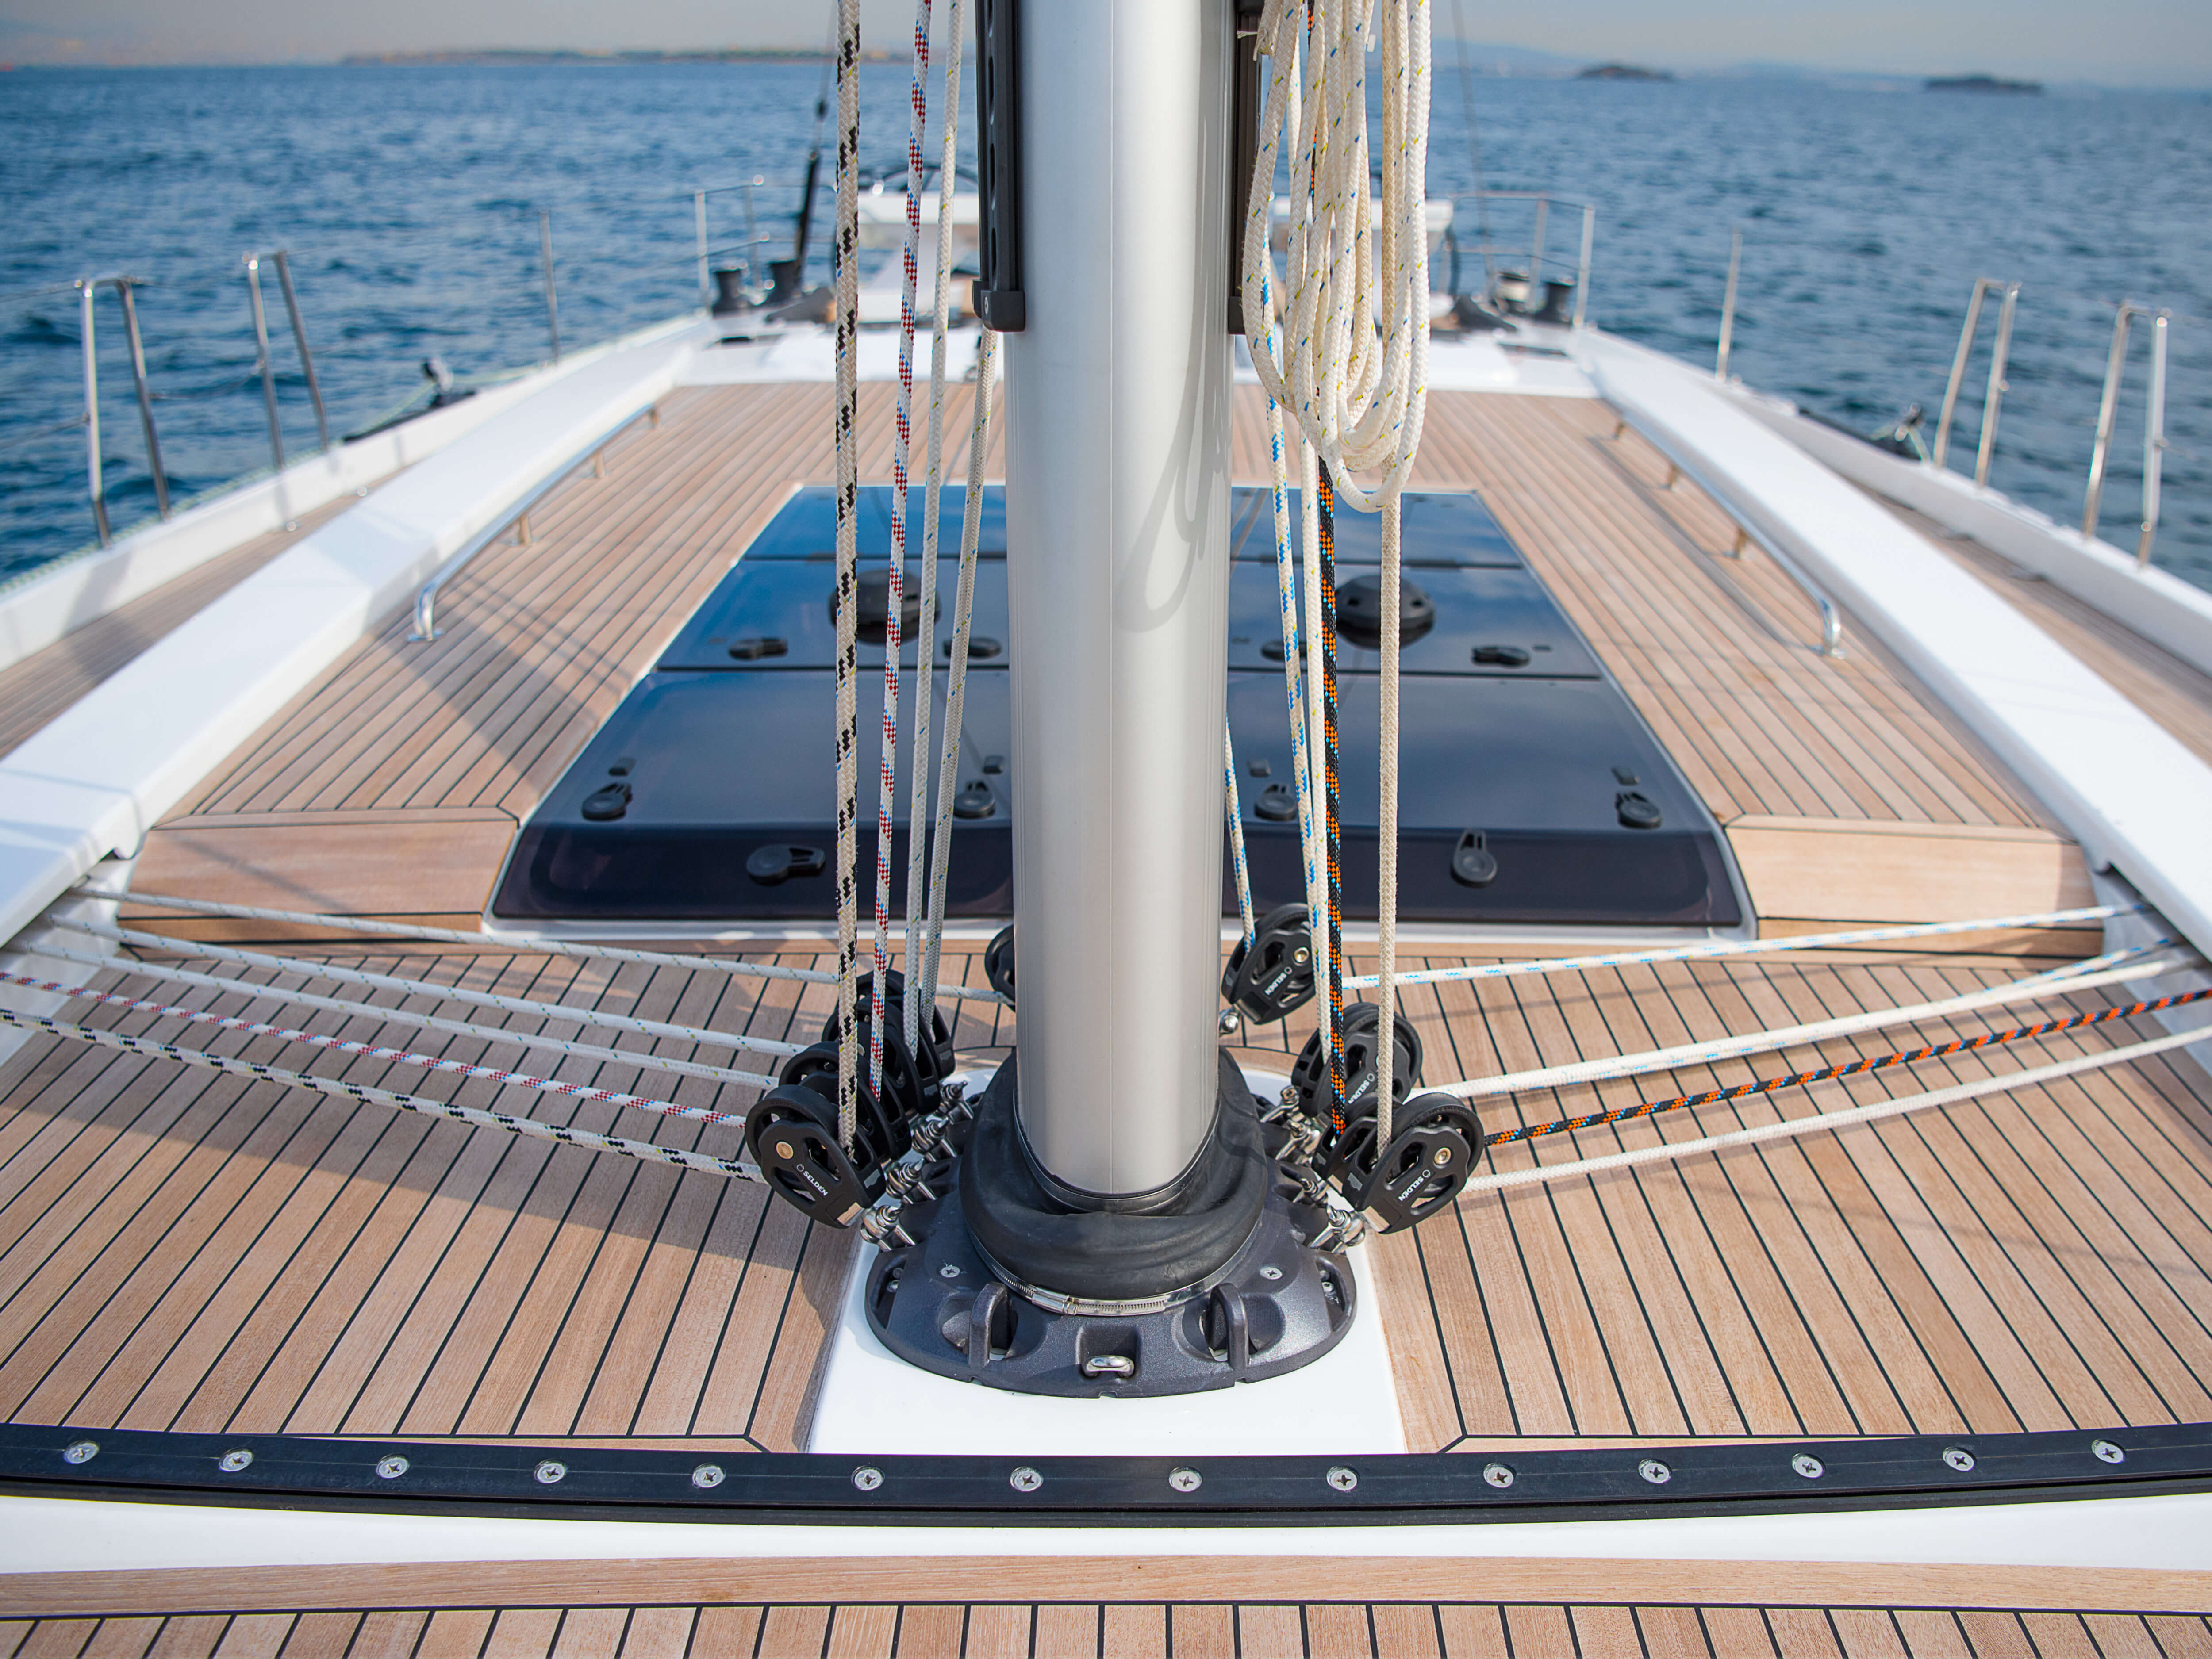 Hanse 588 Exterior at anchor | teak deck, deck hatch | Hanse